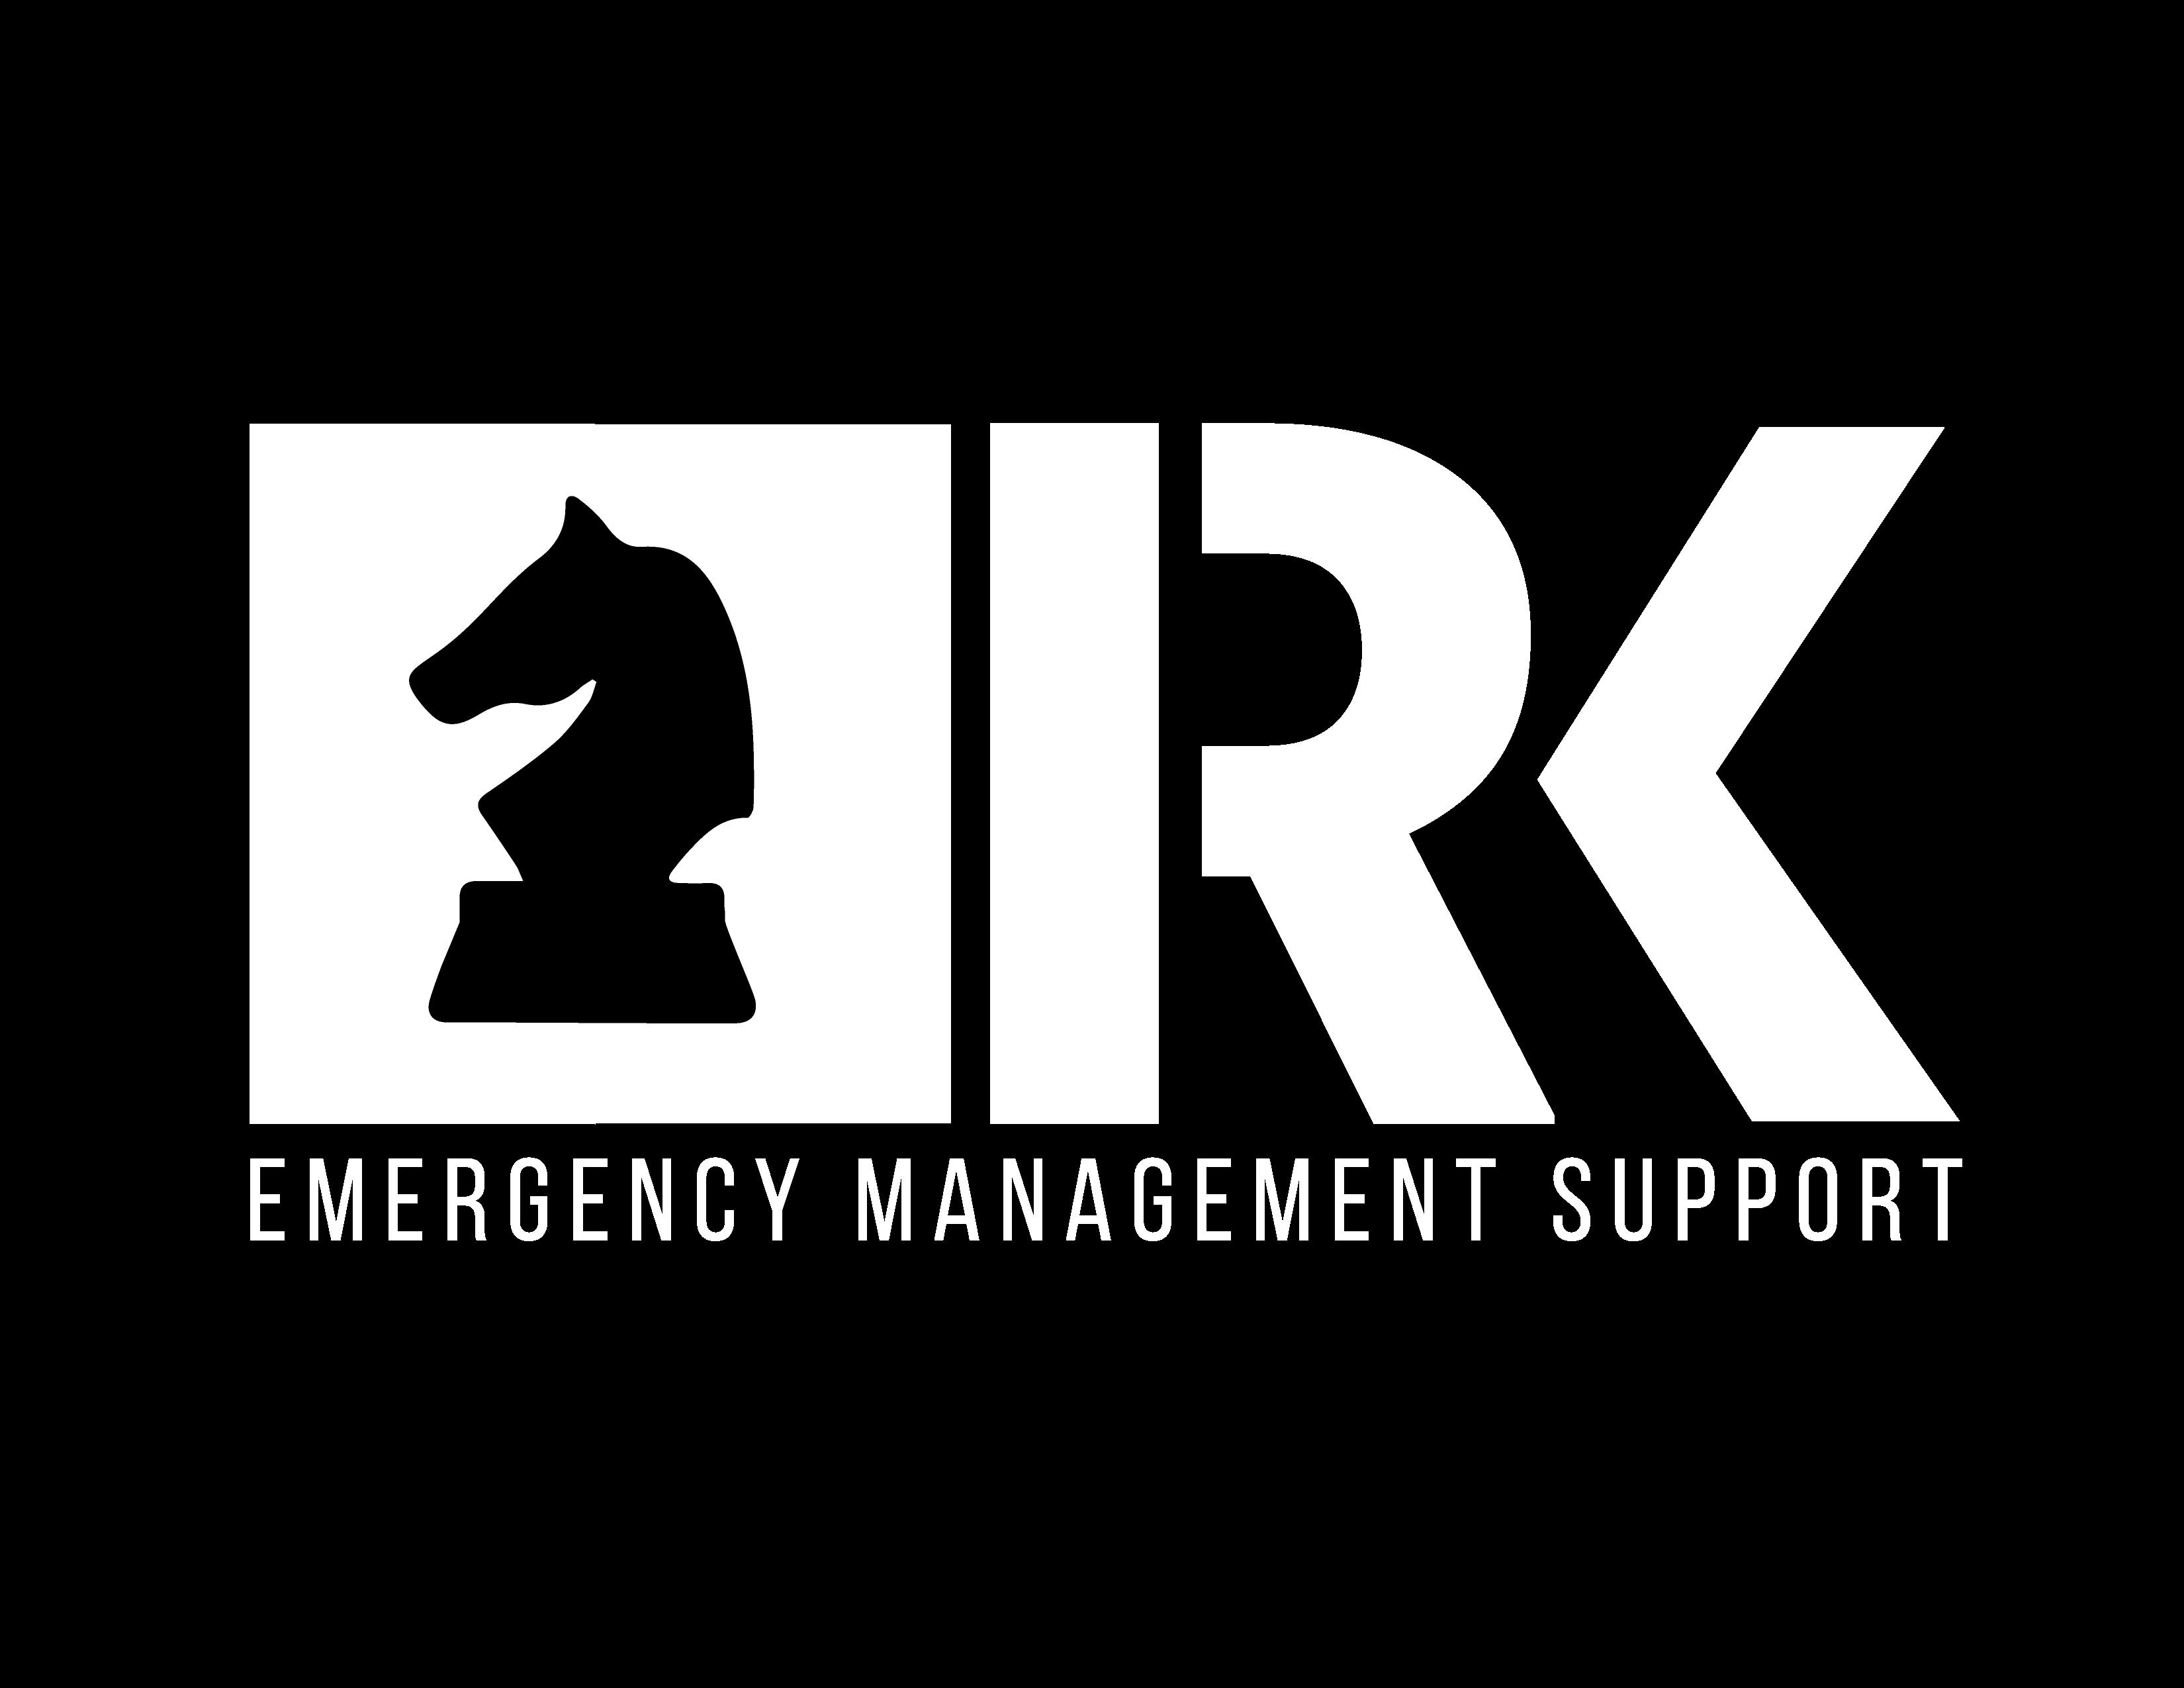 RKEMC